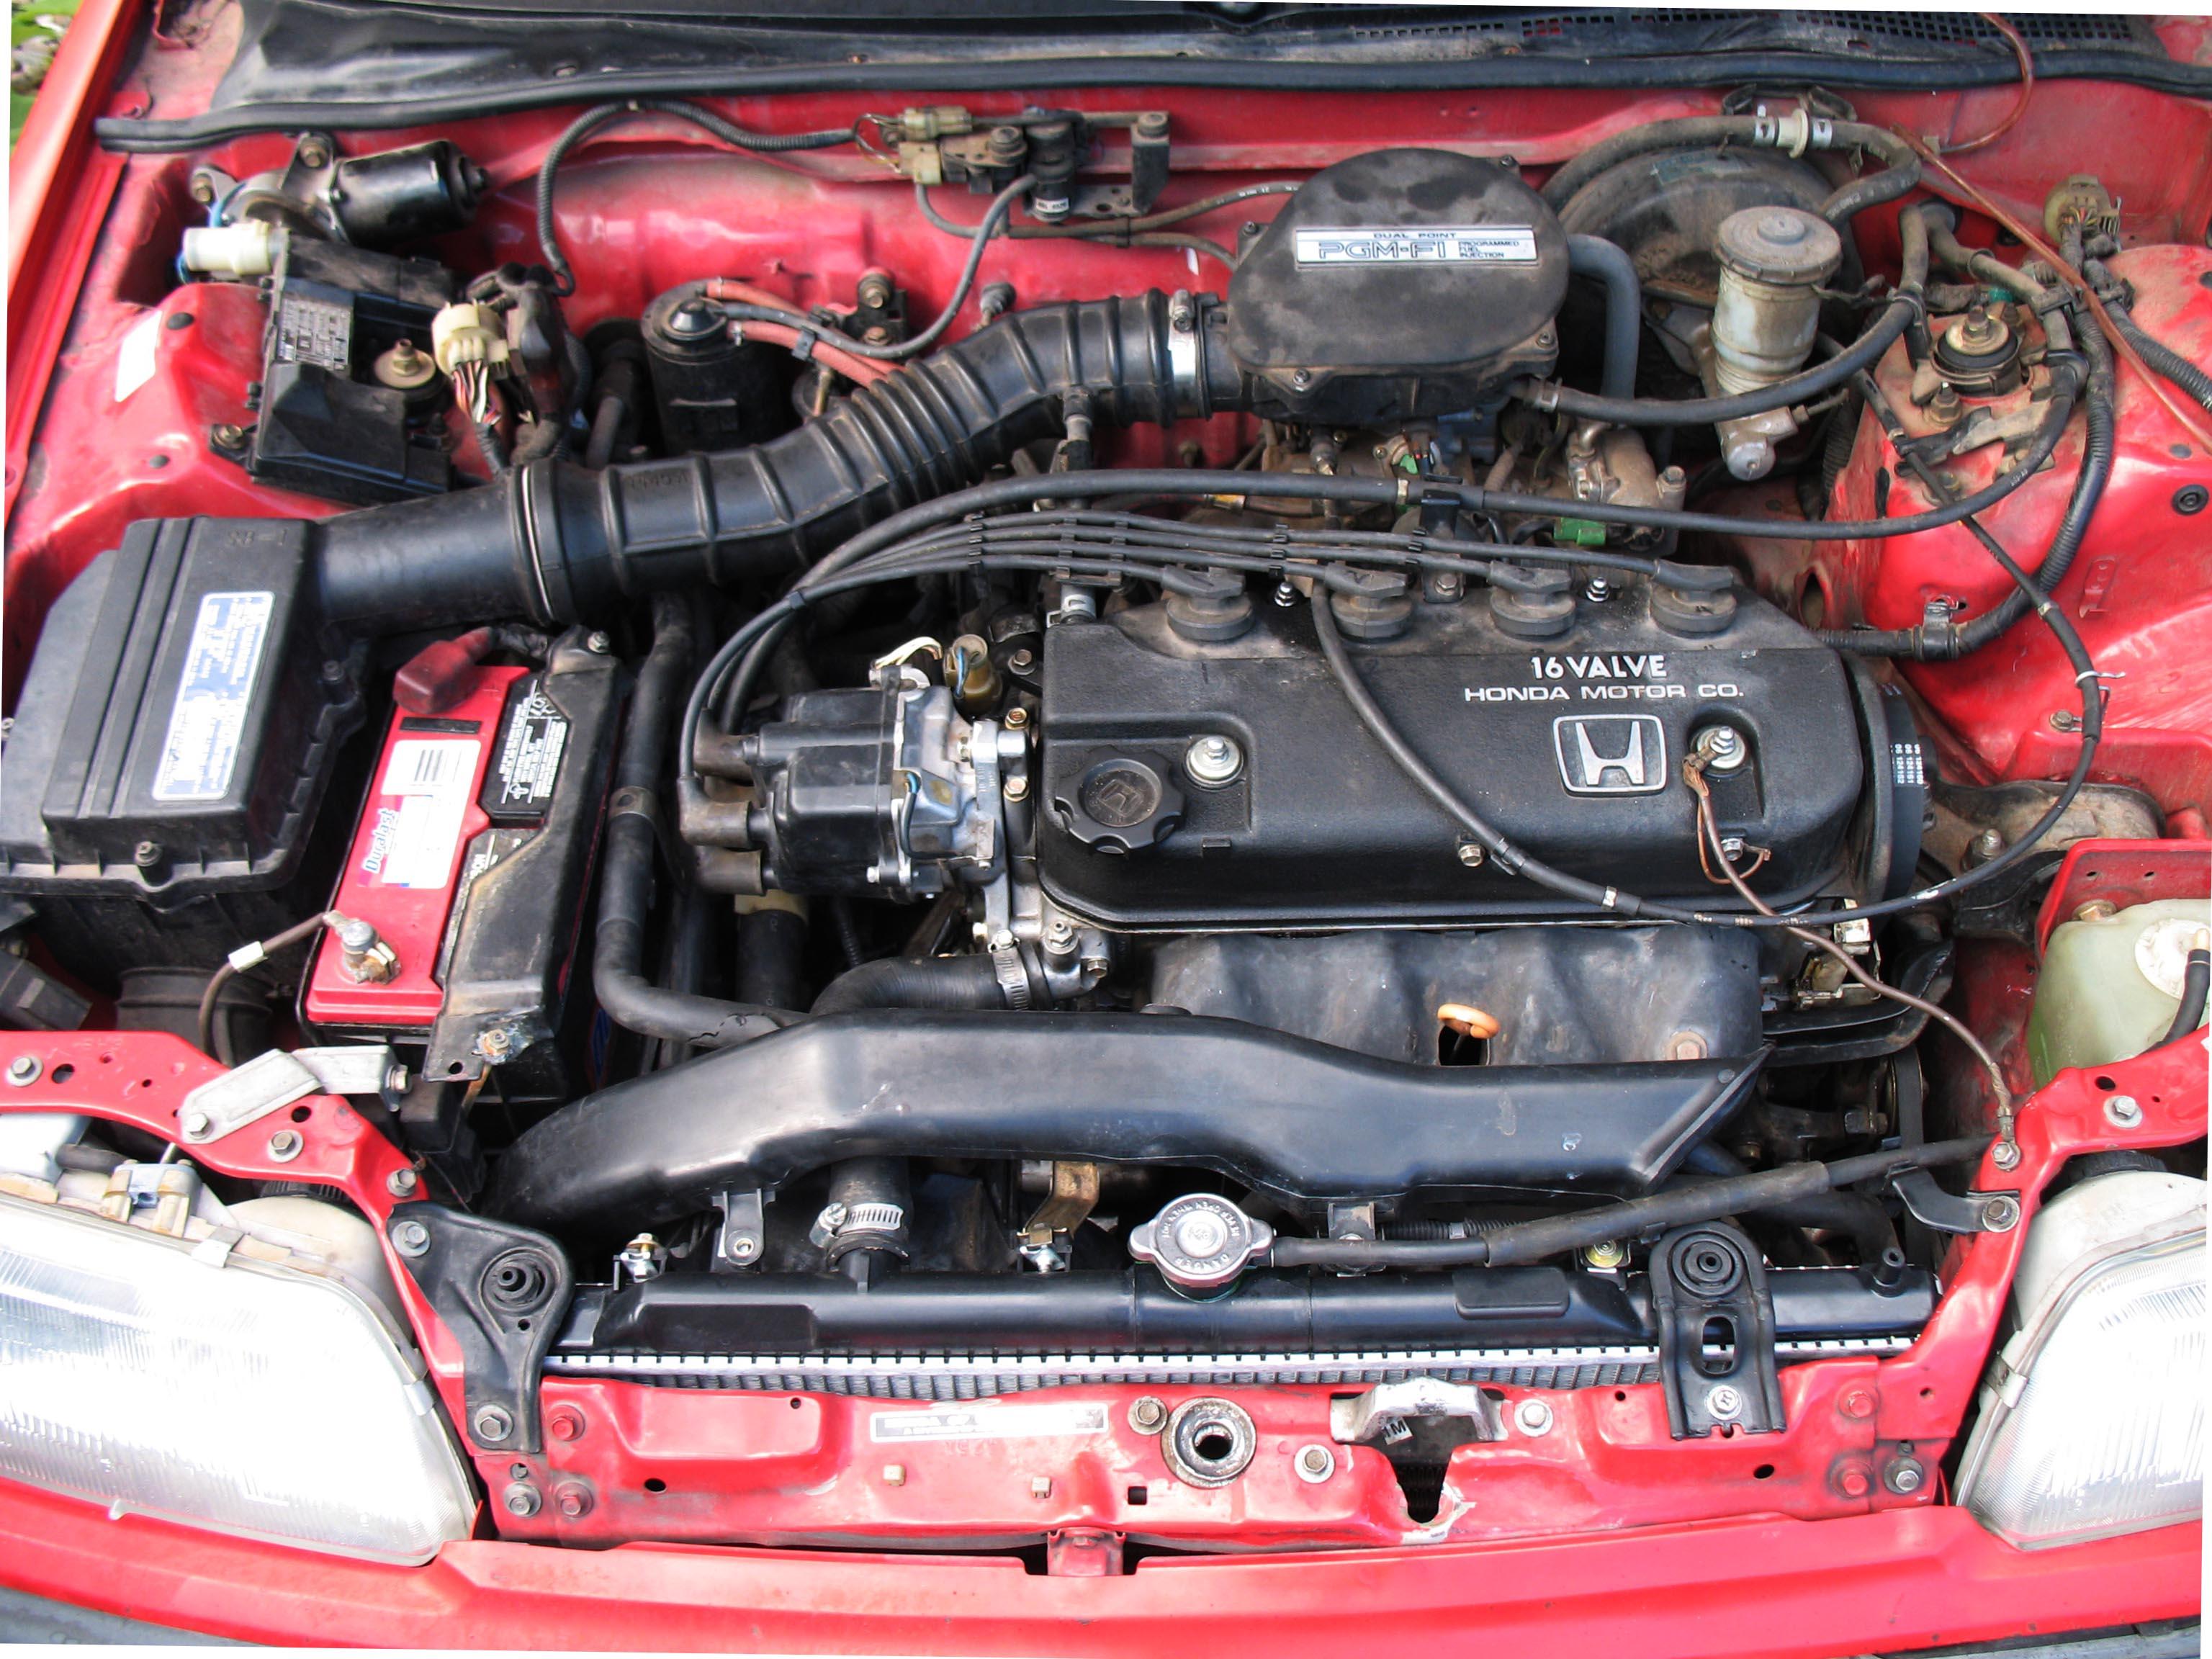 hight resolution of 91 accord engine head diagram wiring library91 accord engine head diagram